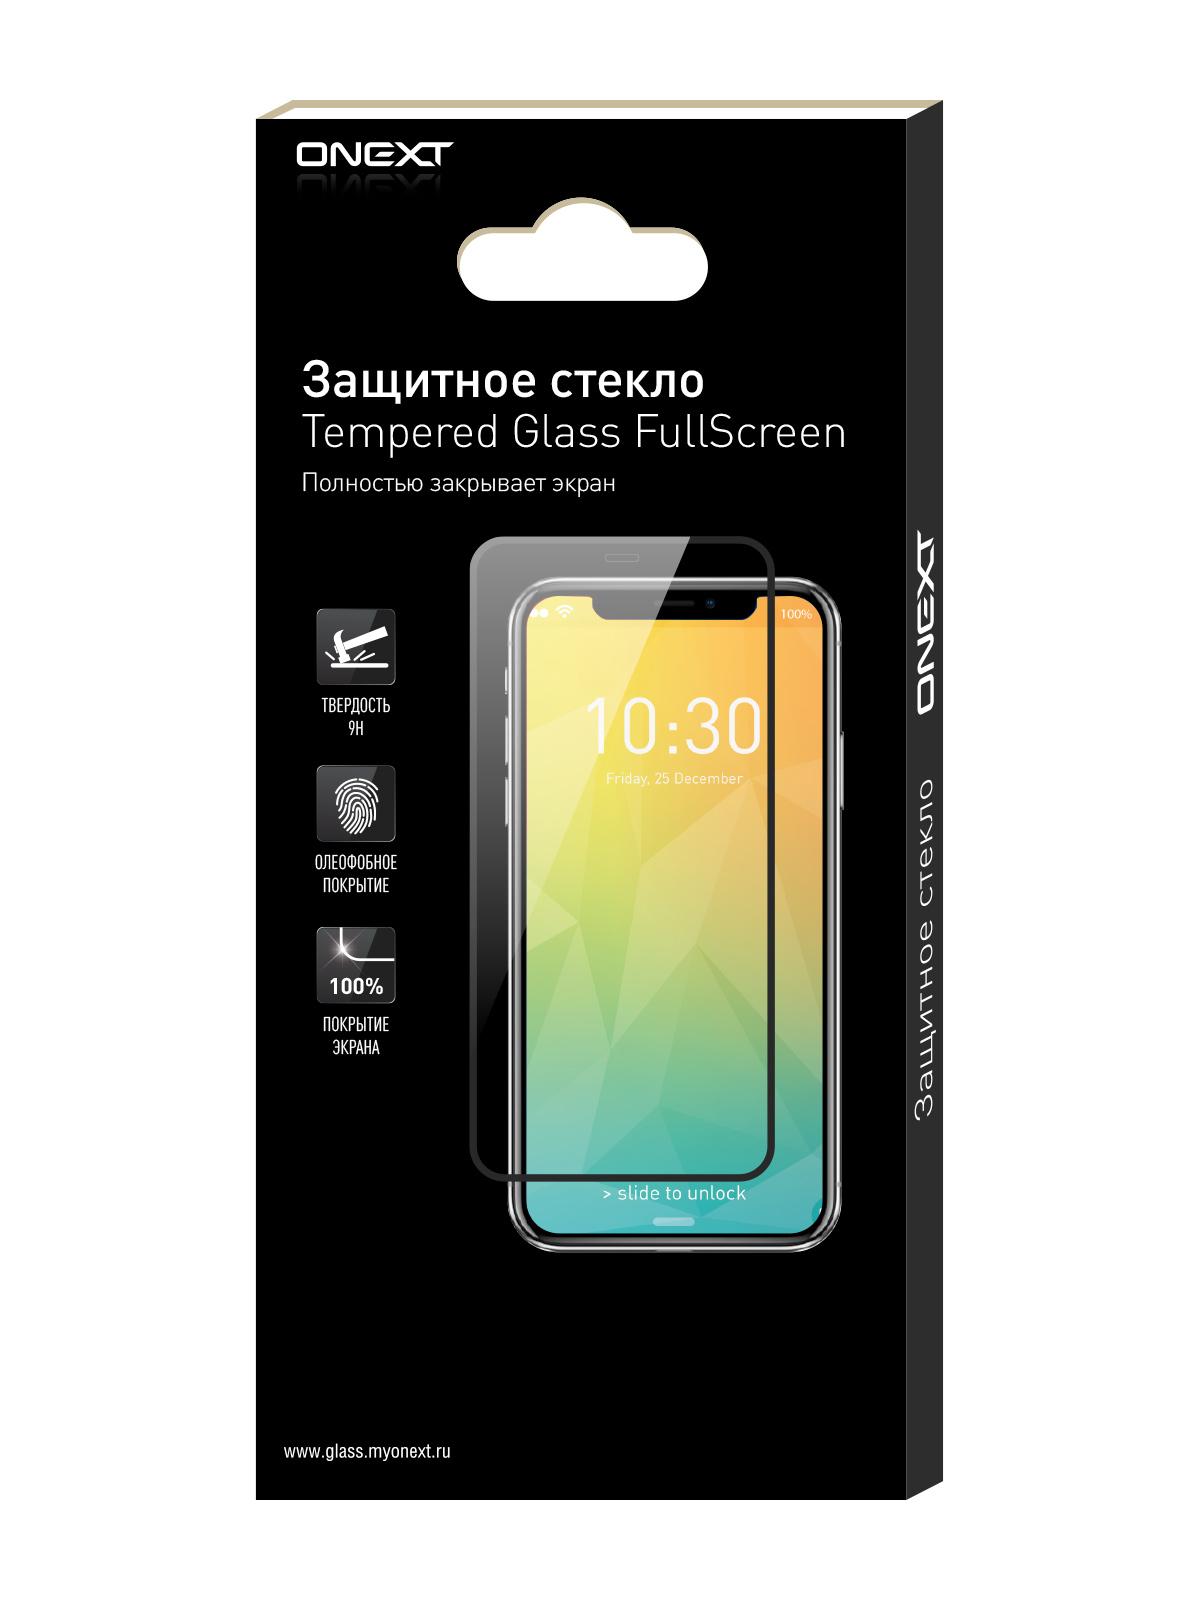 Защитное стекло ONEXT для Xiaomi Mi Max 2 White